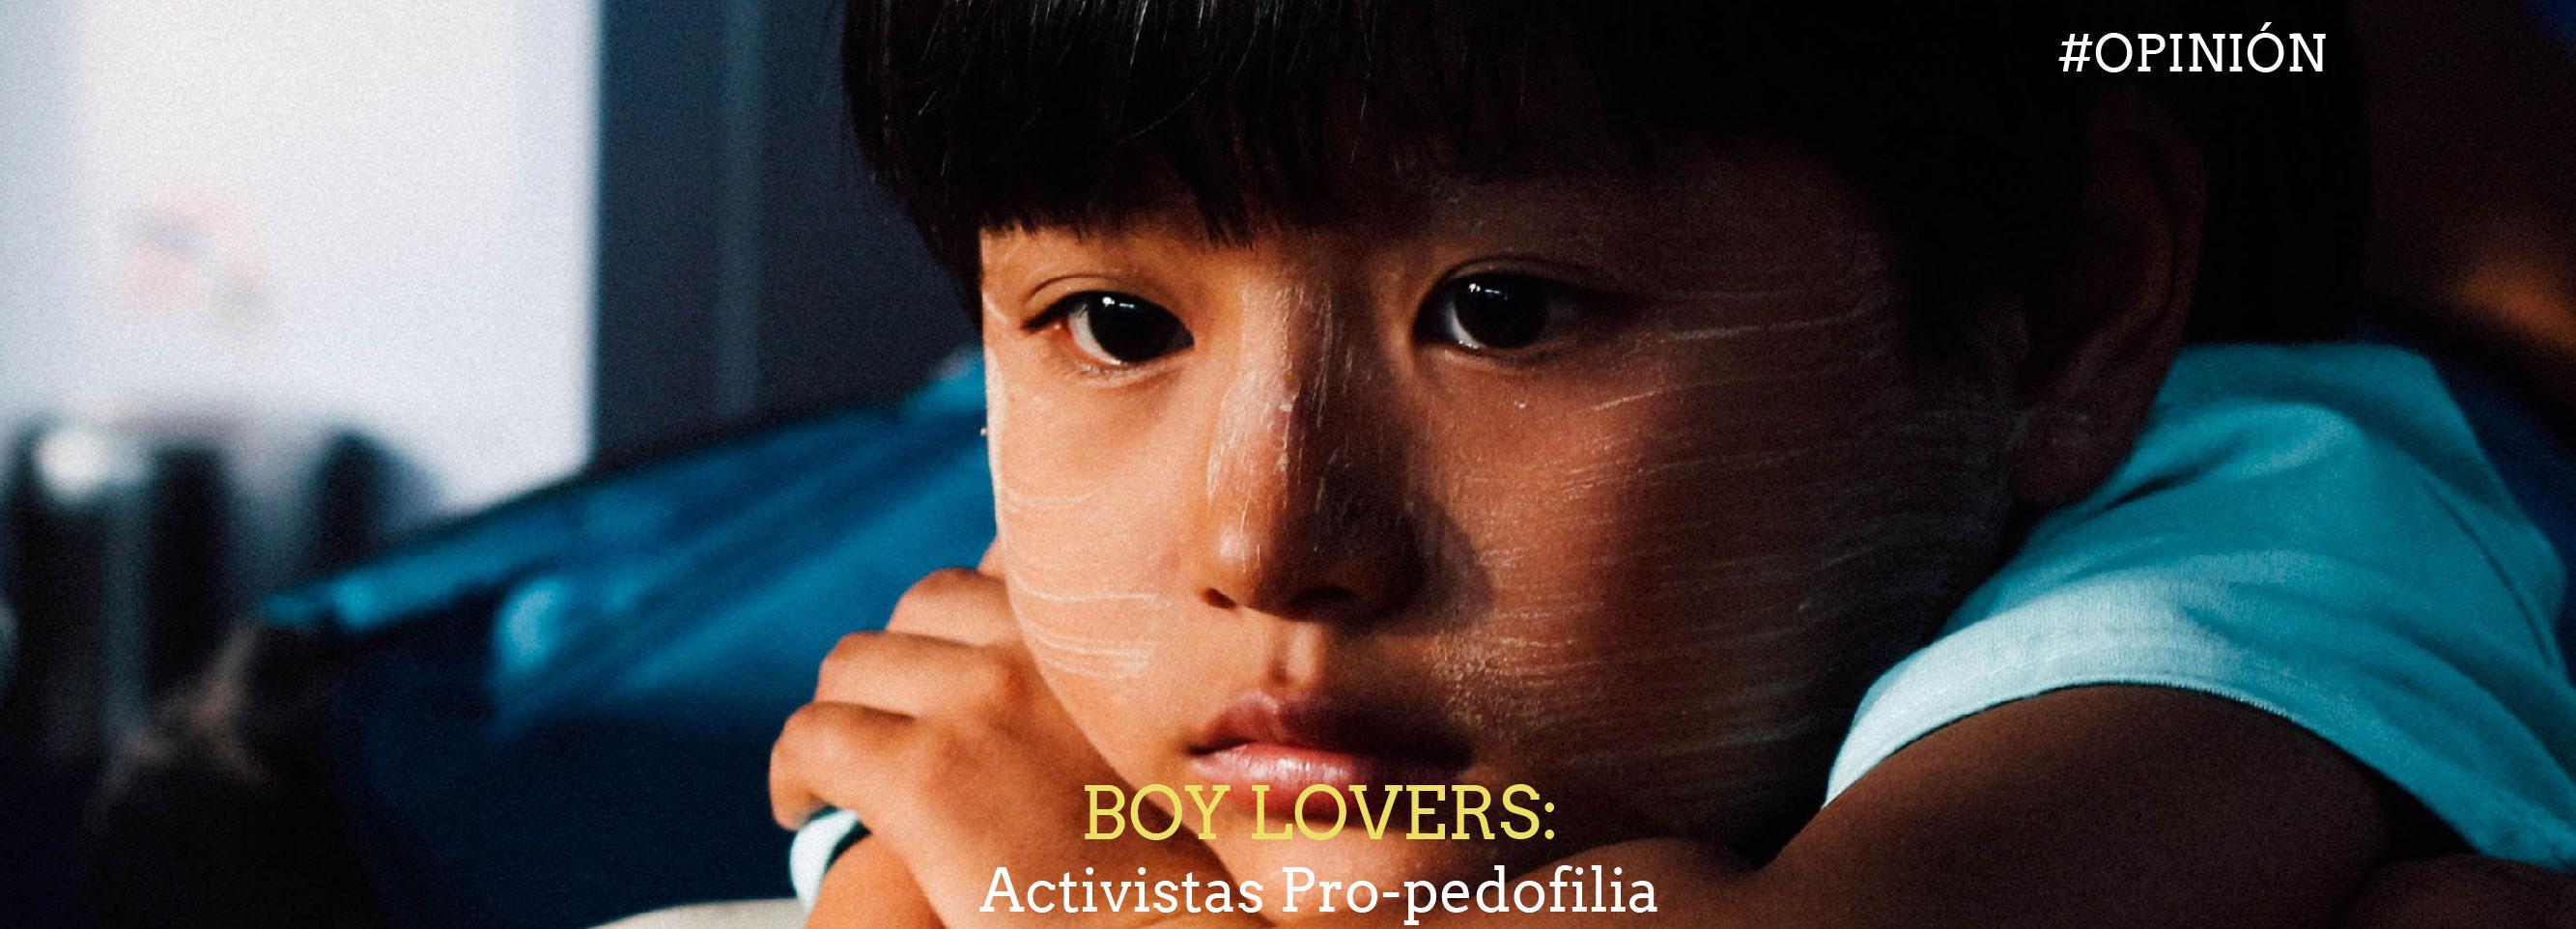 Boy Lovers: Activistas Pro-pedofilia